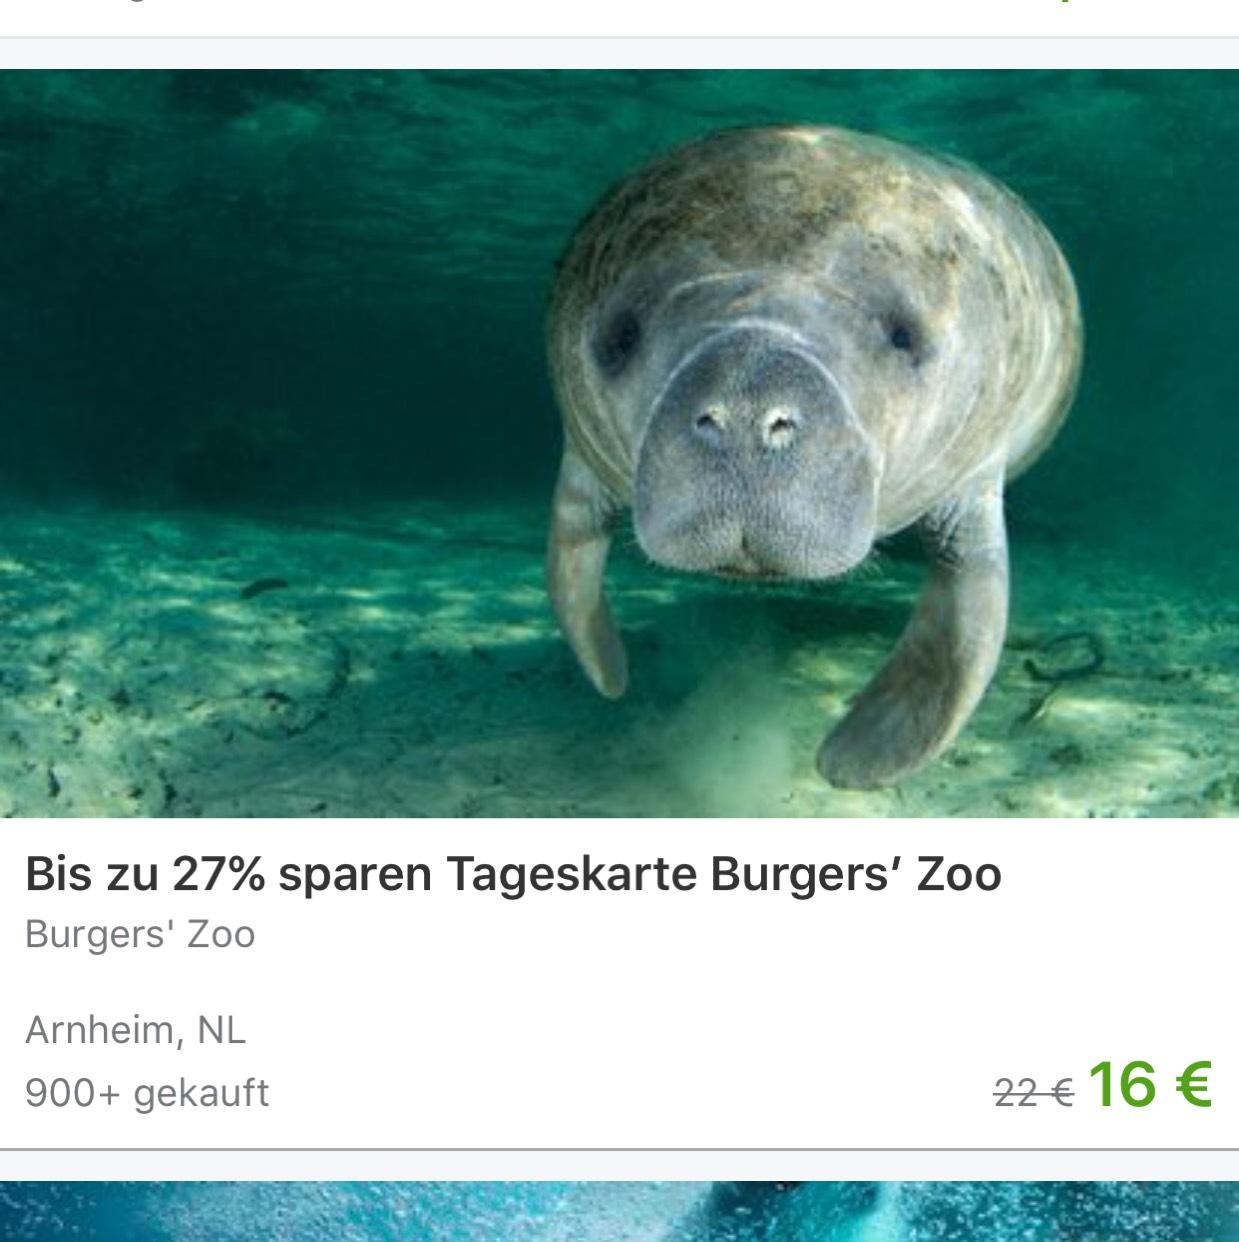 Burgers Zoo €13,60 ipv €22